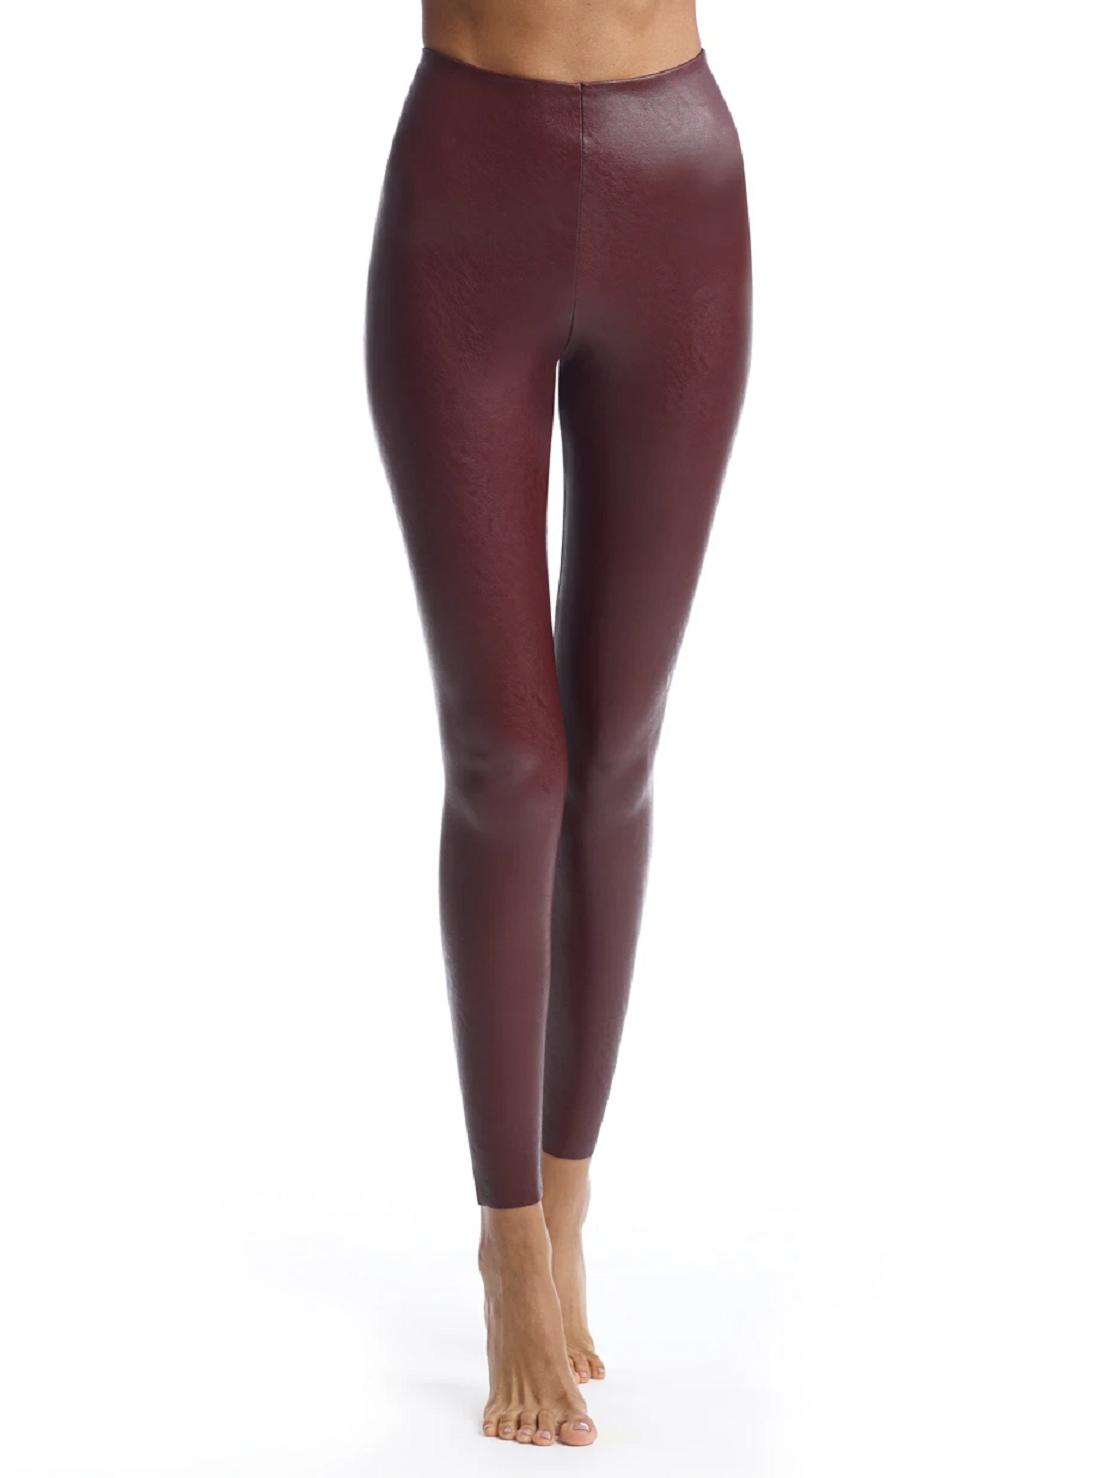 6 Wholesale Faux Leather Stretchey Pants